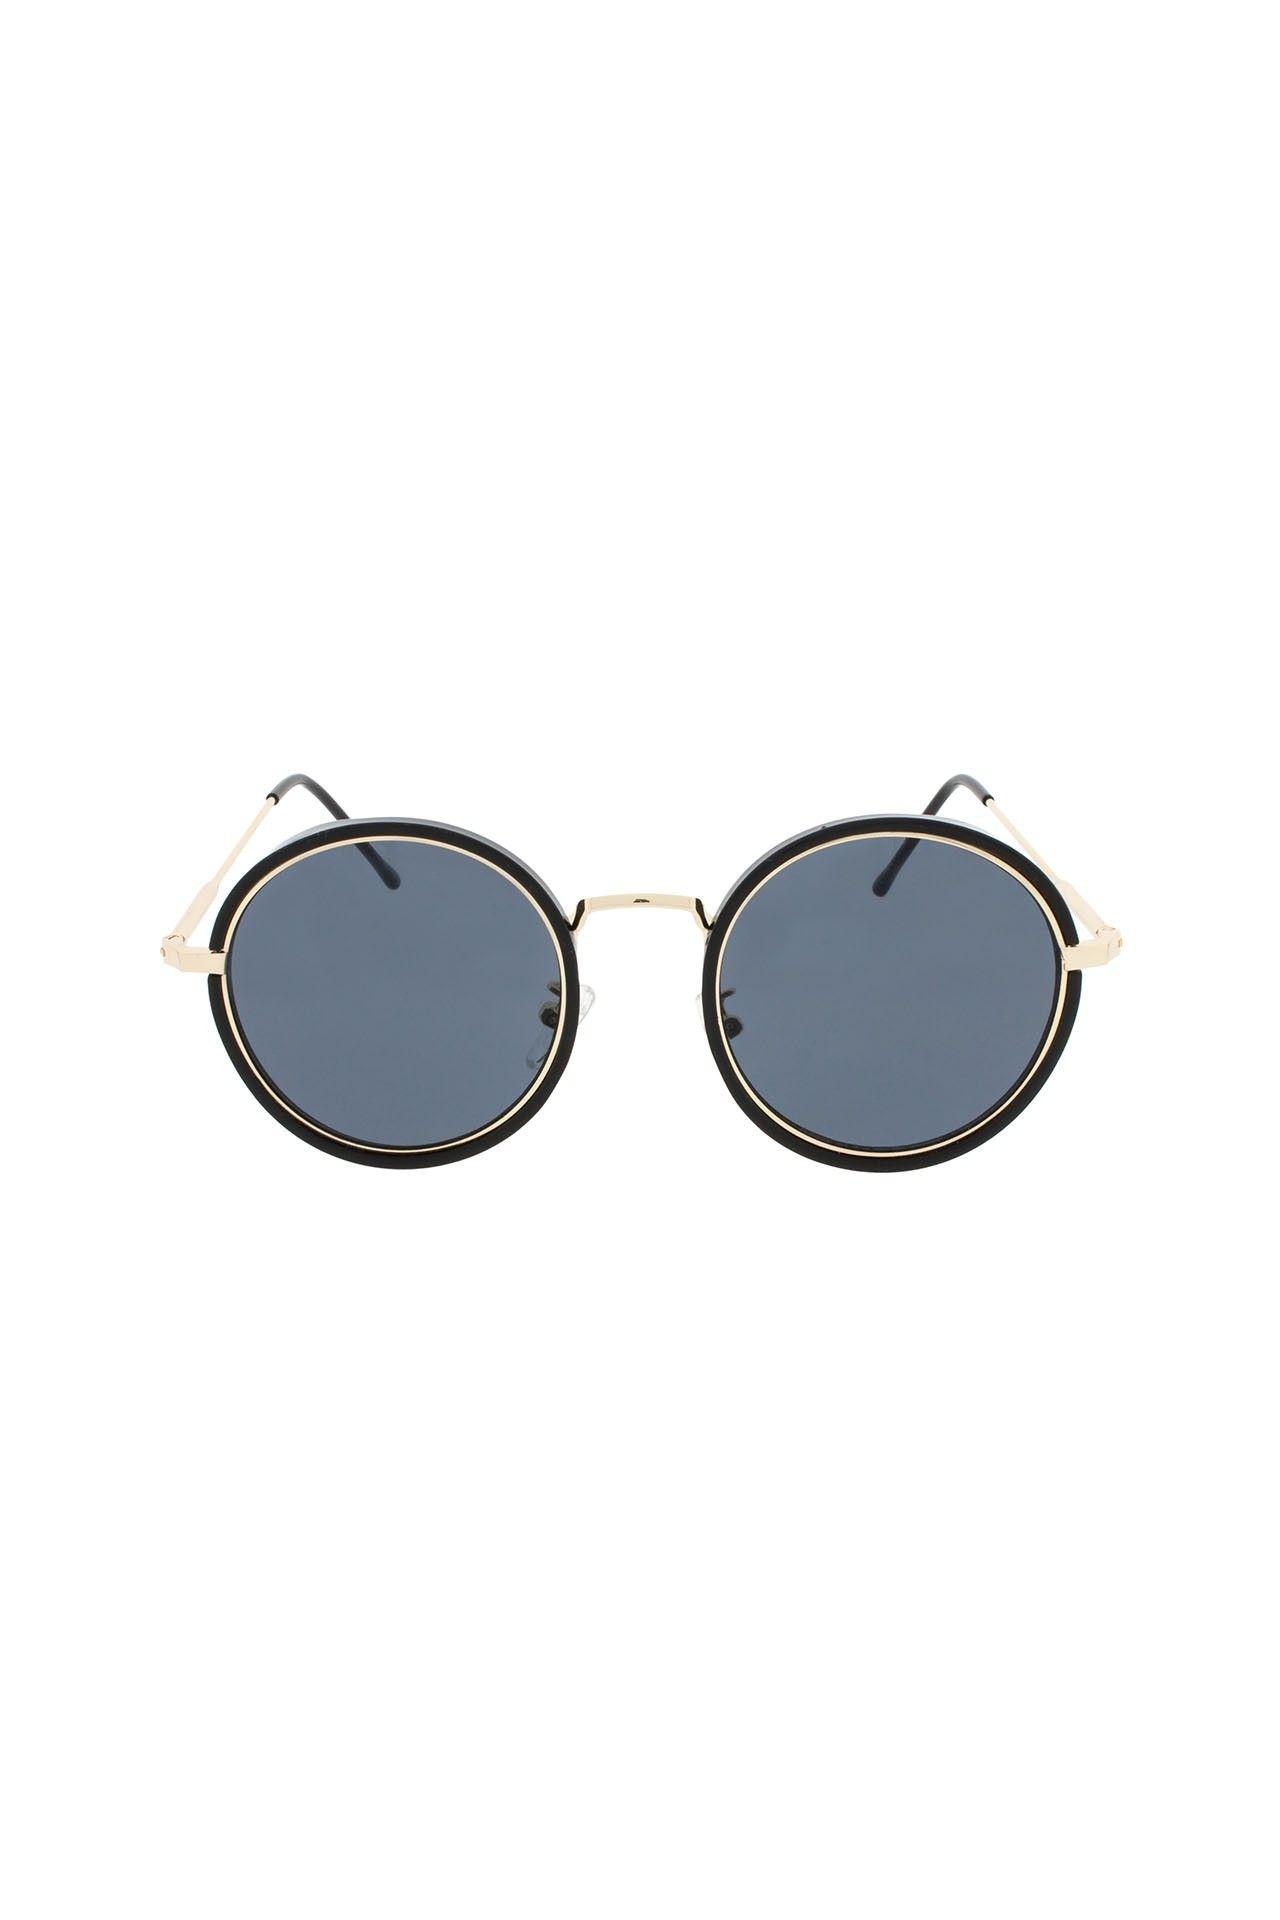 Afbeelding van Icon Eyewear 16M6019 B Zonnebril Black Frame